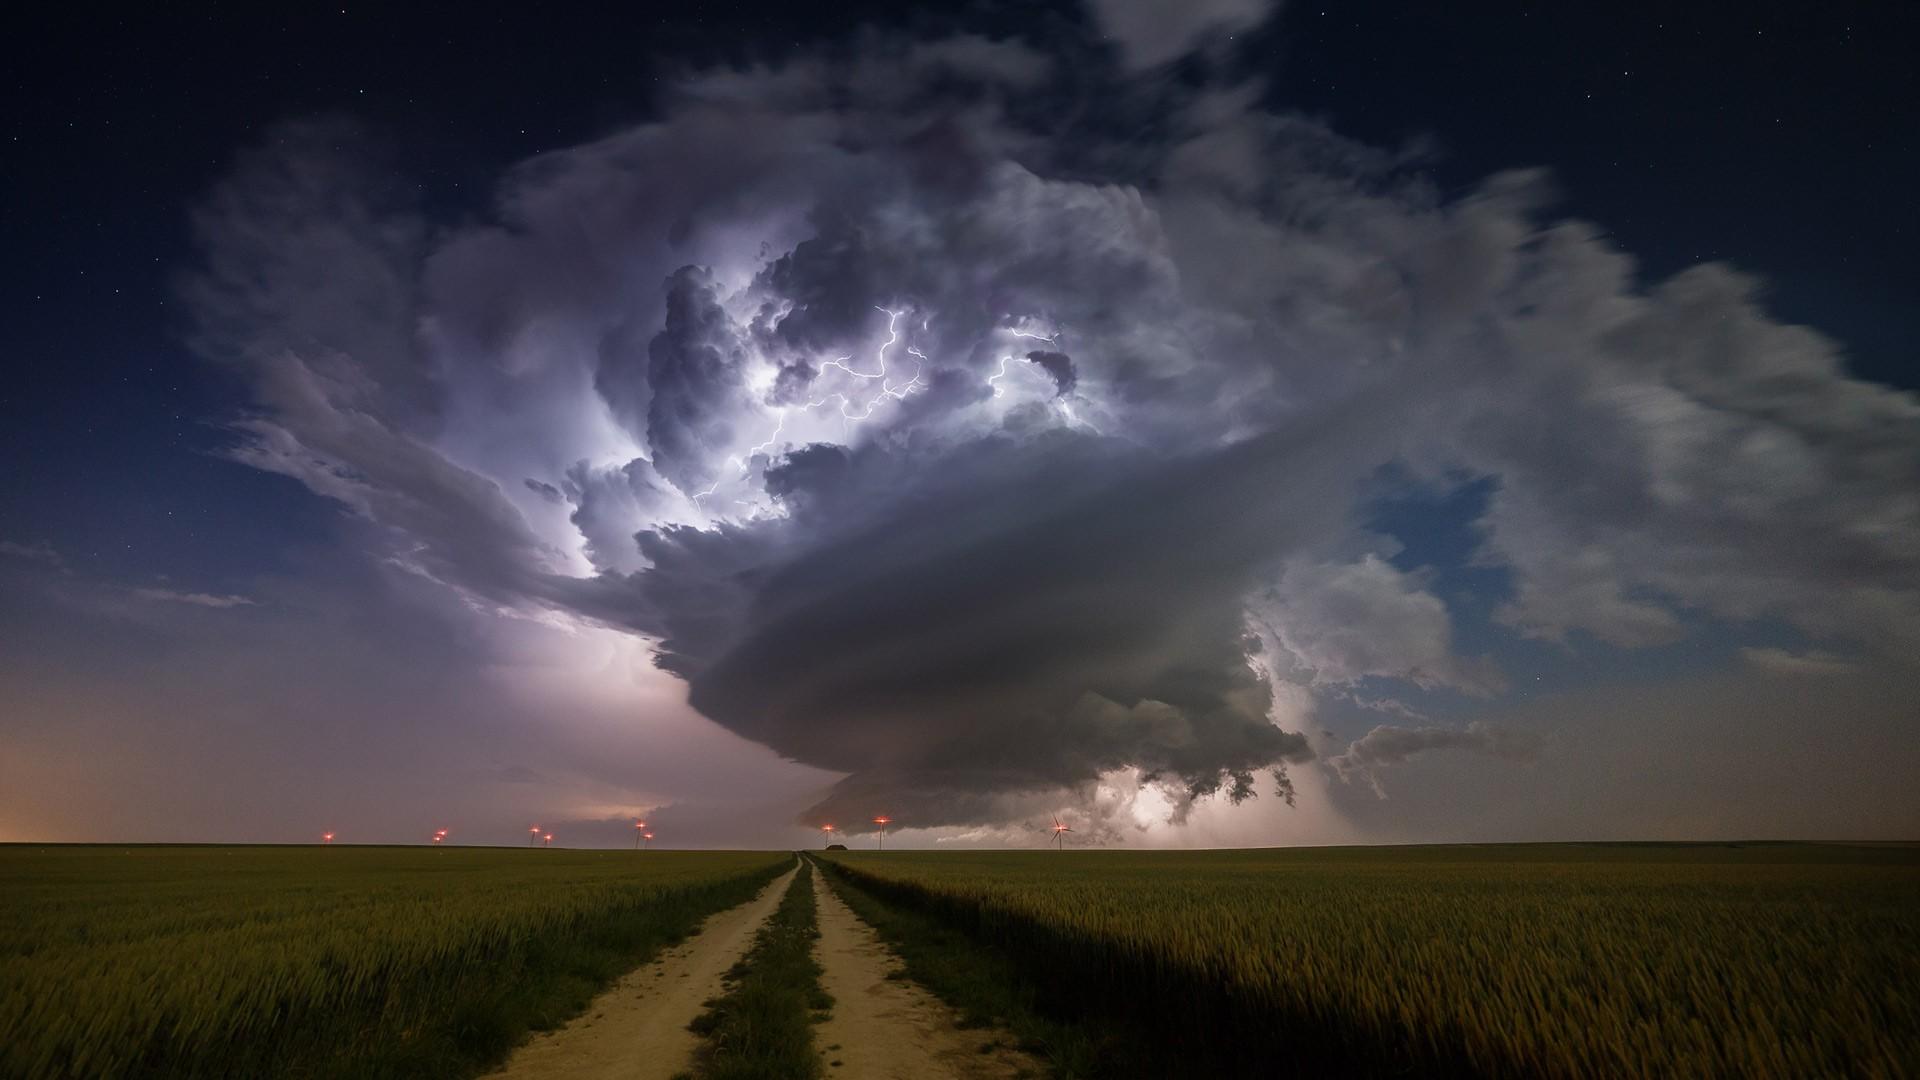 nature Landscape Clouds Supercell nature Storm 1920x1080